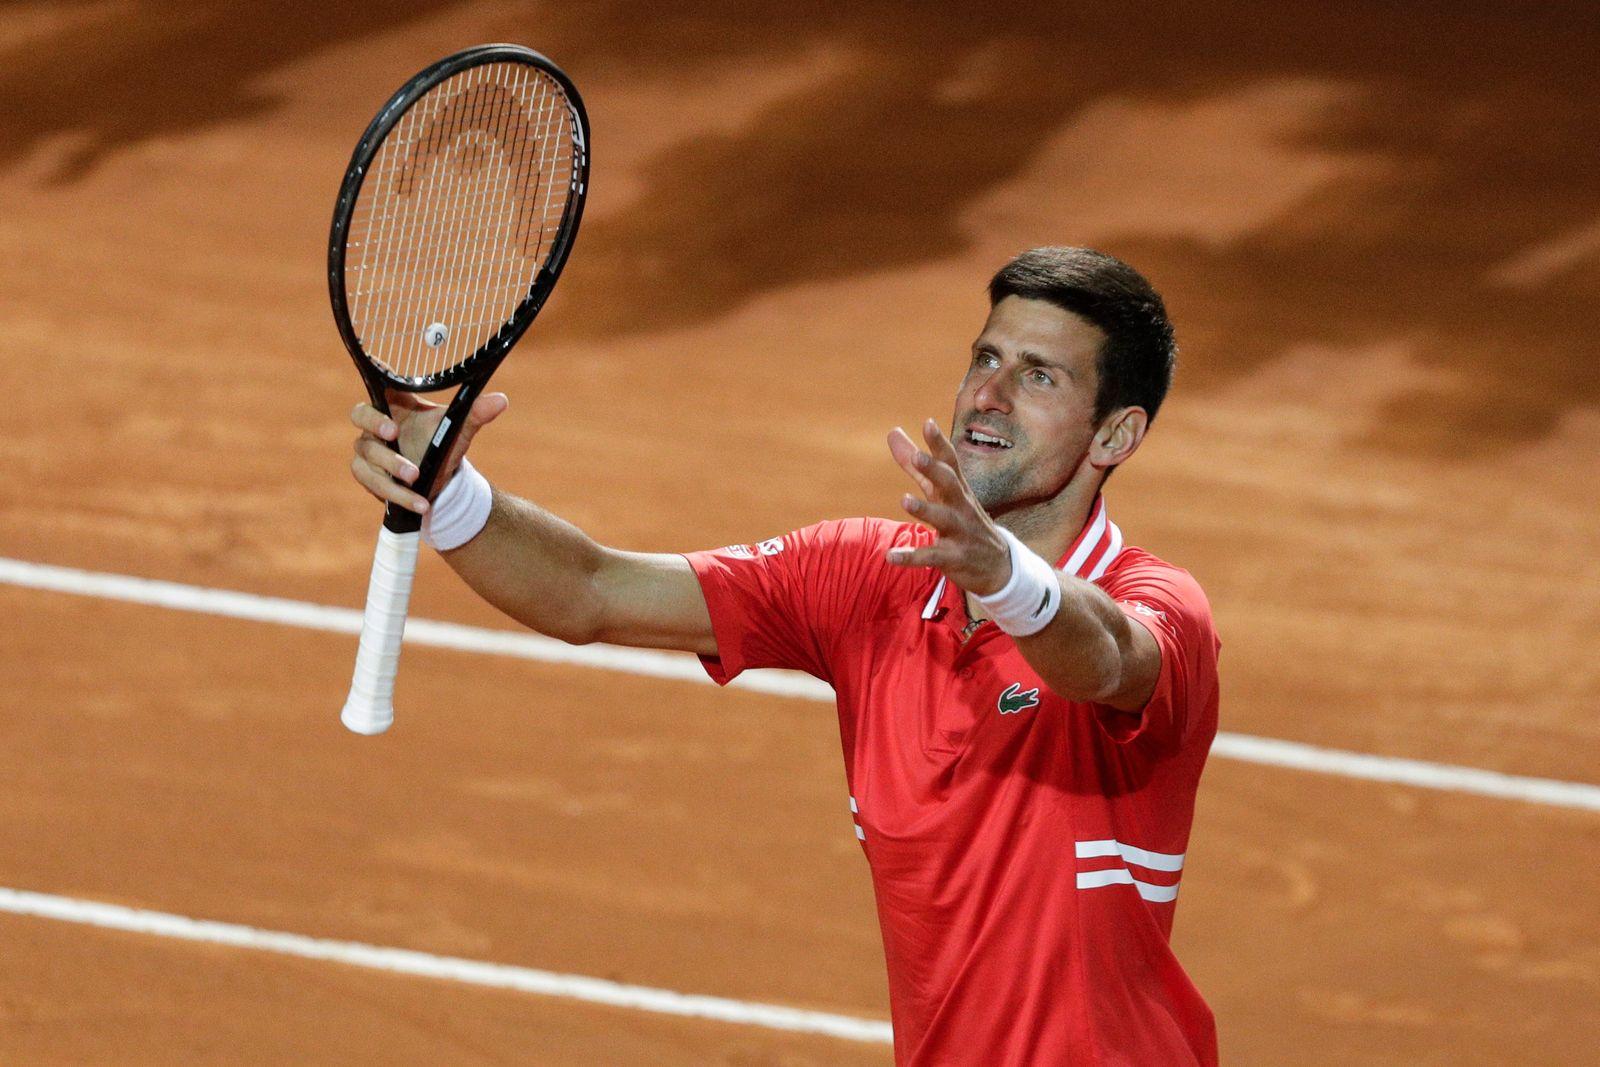 Italy Tennis Open